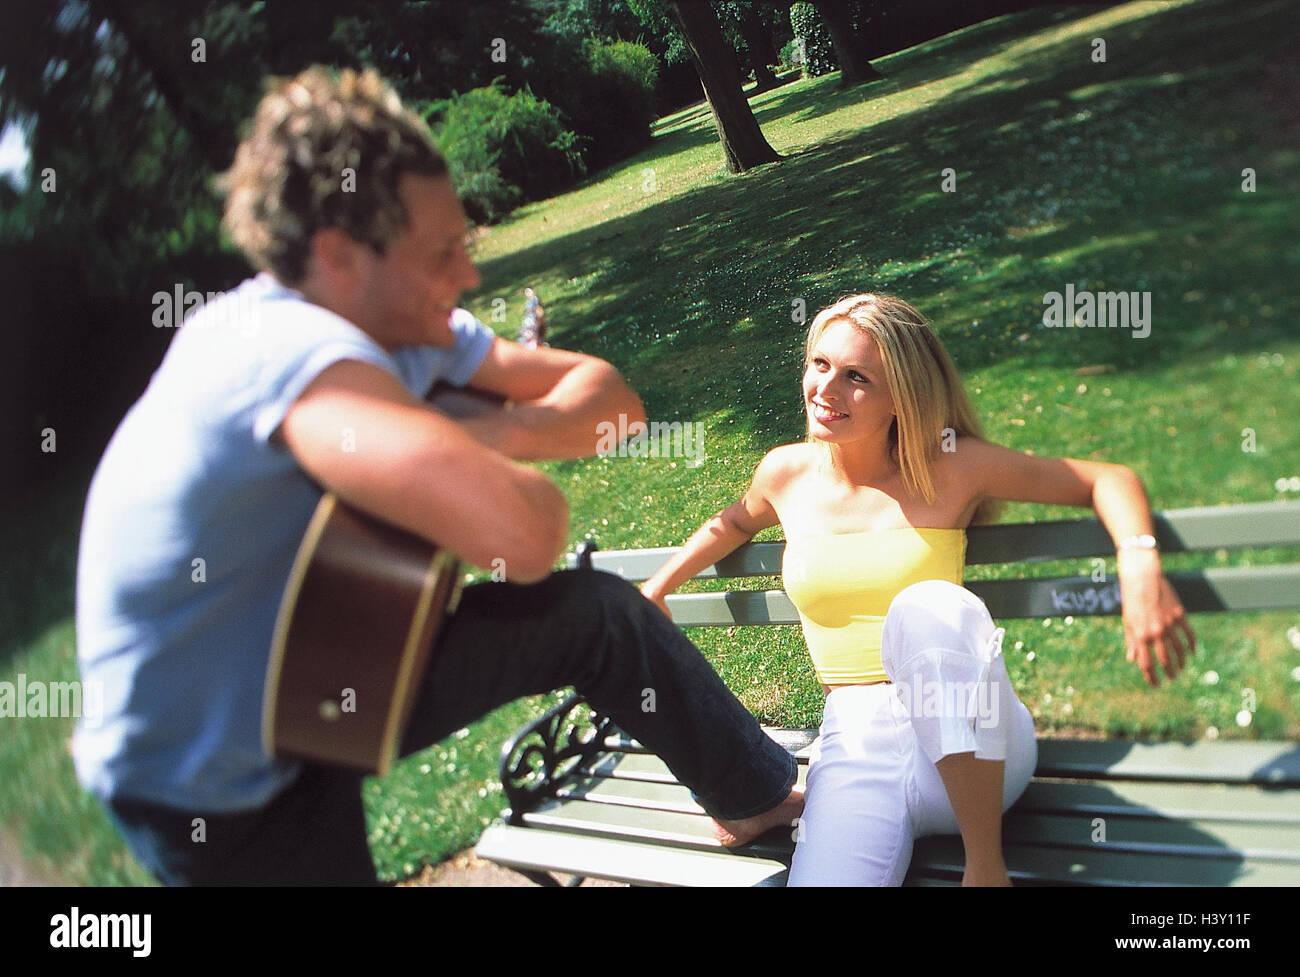 Park, woman, bank, sit, man, guitar, eye contact, outside, park-bench, summer, flirtation, flirt, couple, excursion, - Stock Image